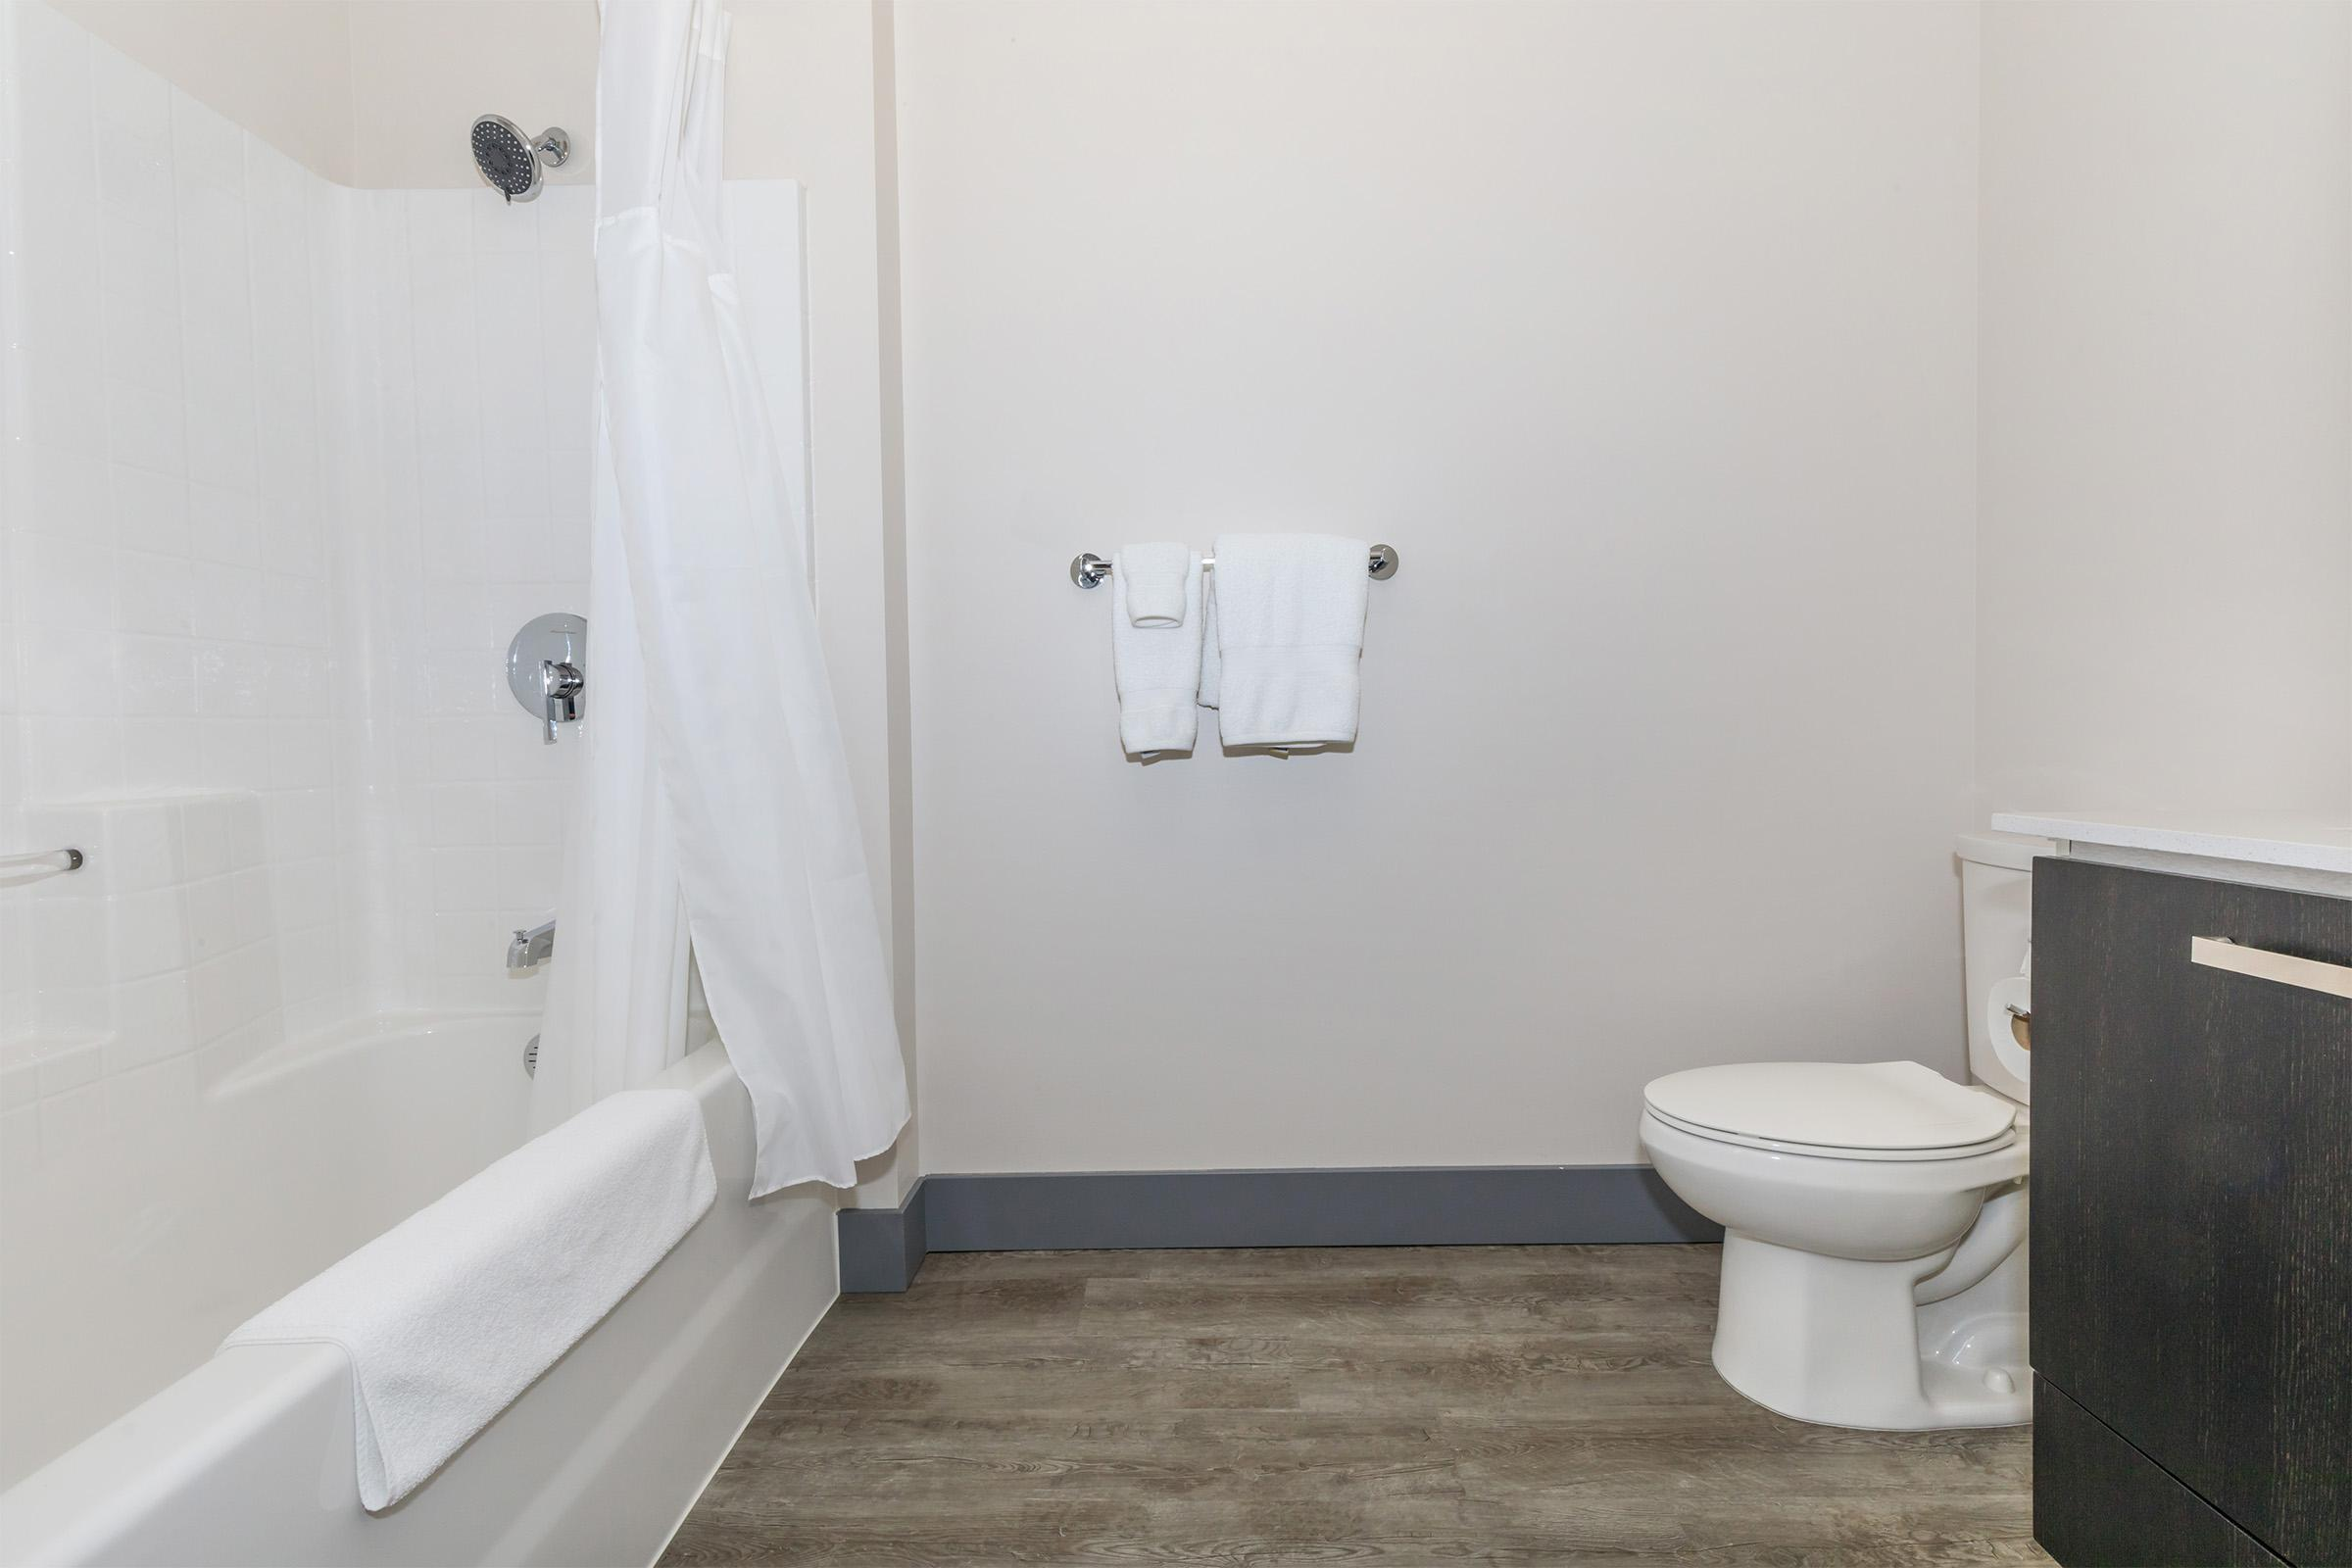 a room with a bath tub